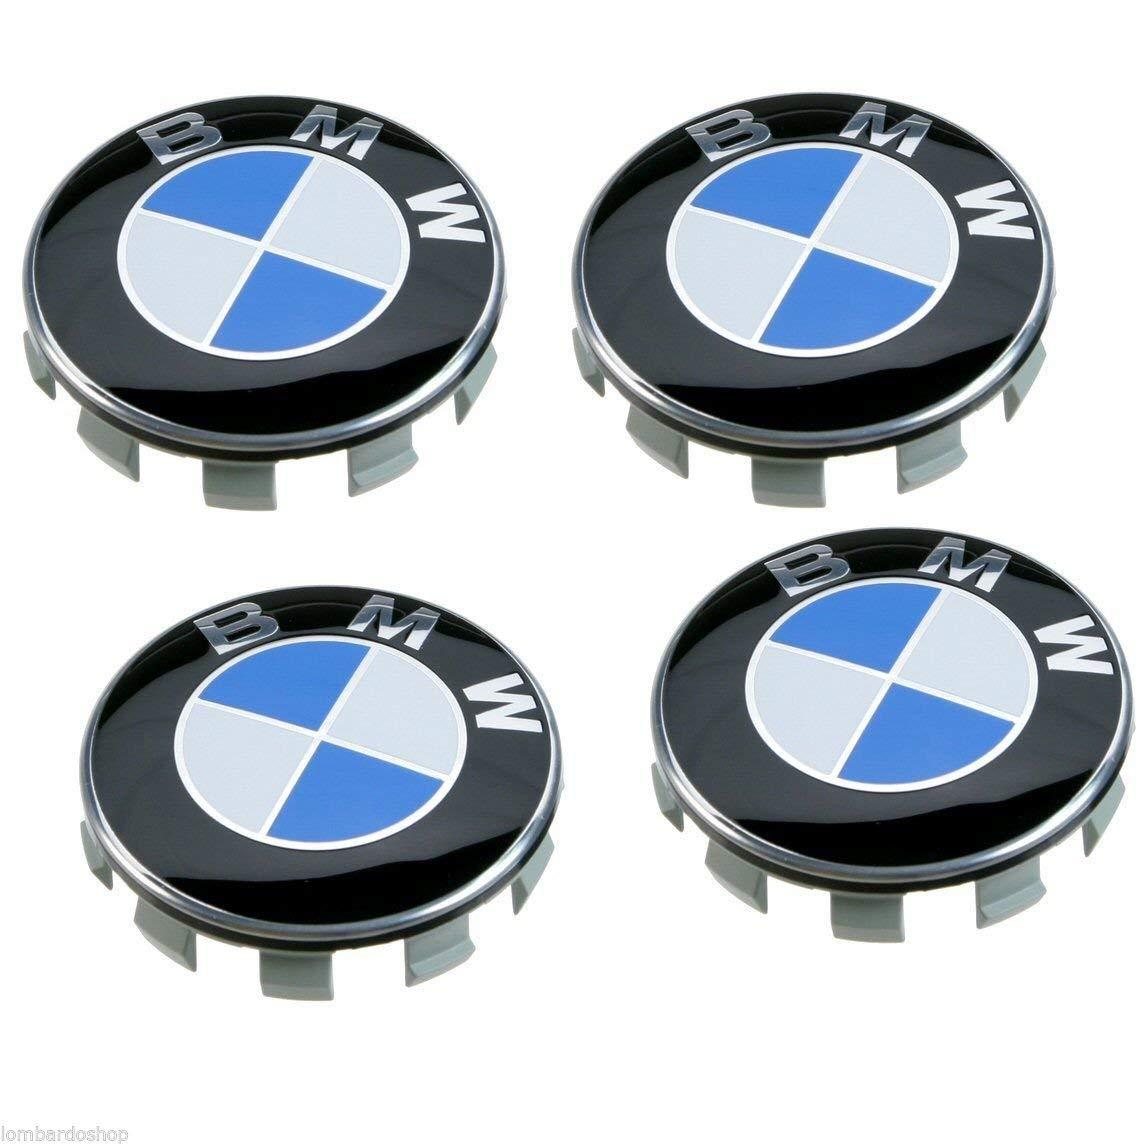 Hirido 4 pi/èce 68mm Logo embleme enjoliveurs de moyeu de Roue enjoliveurs de Cache moyeux pour Roue pour BMW